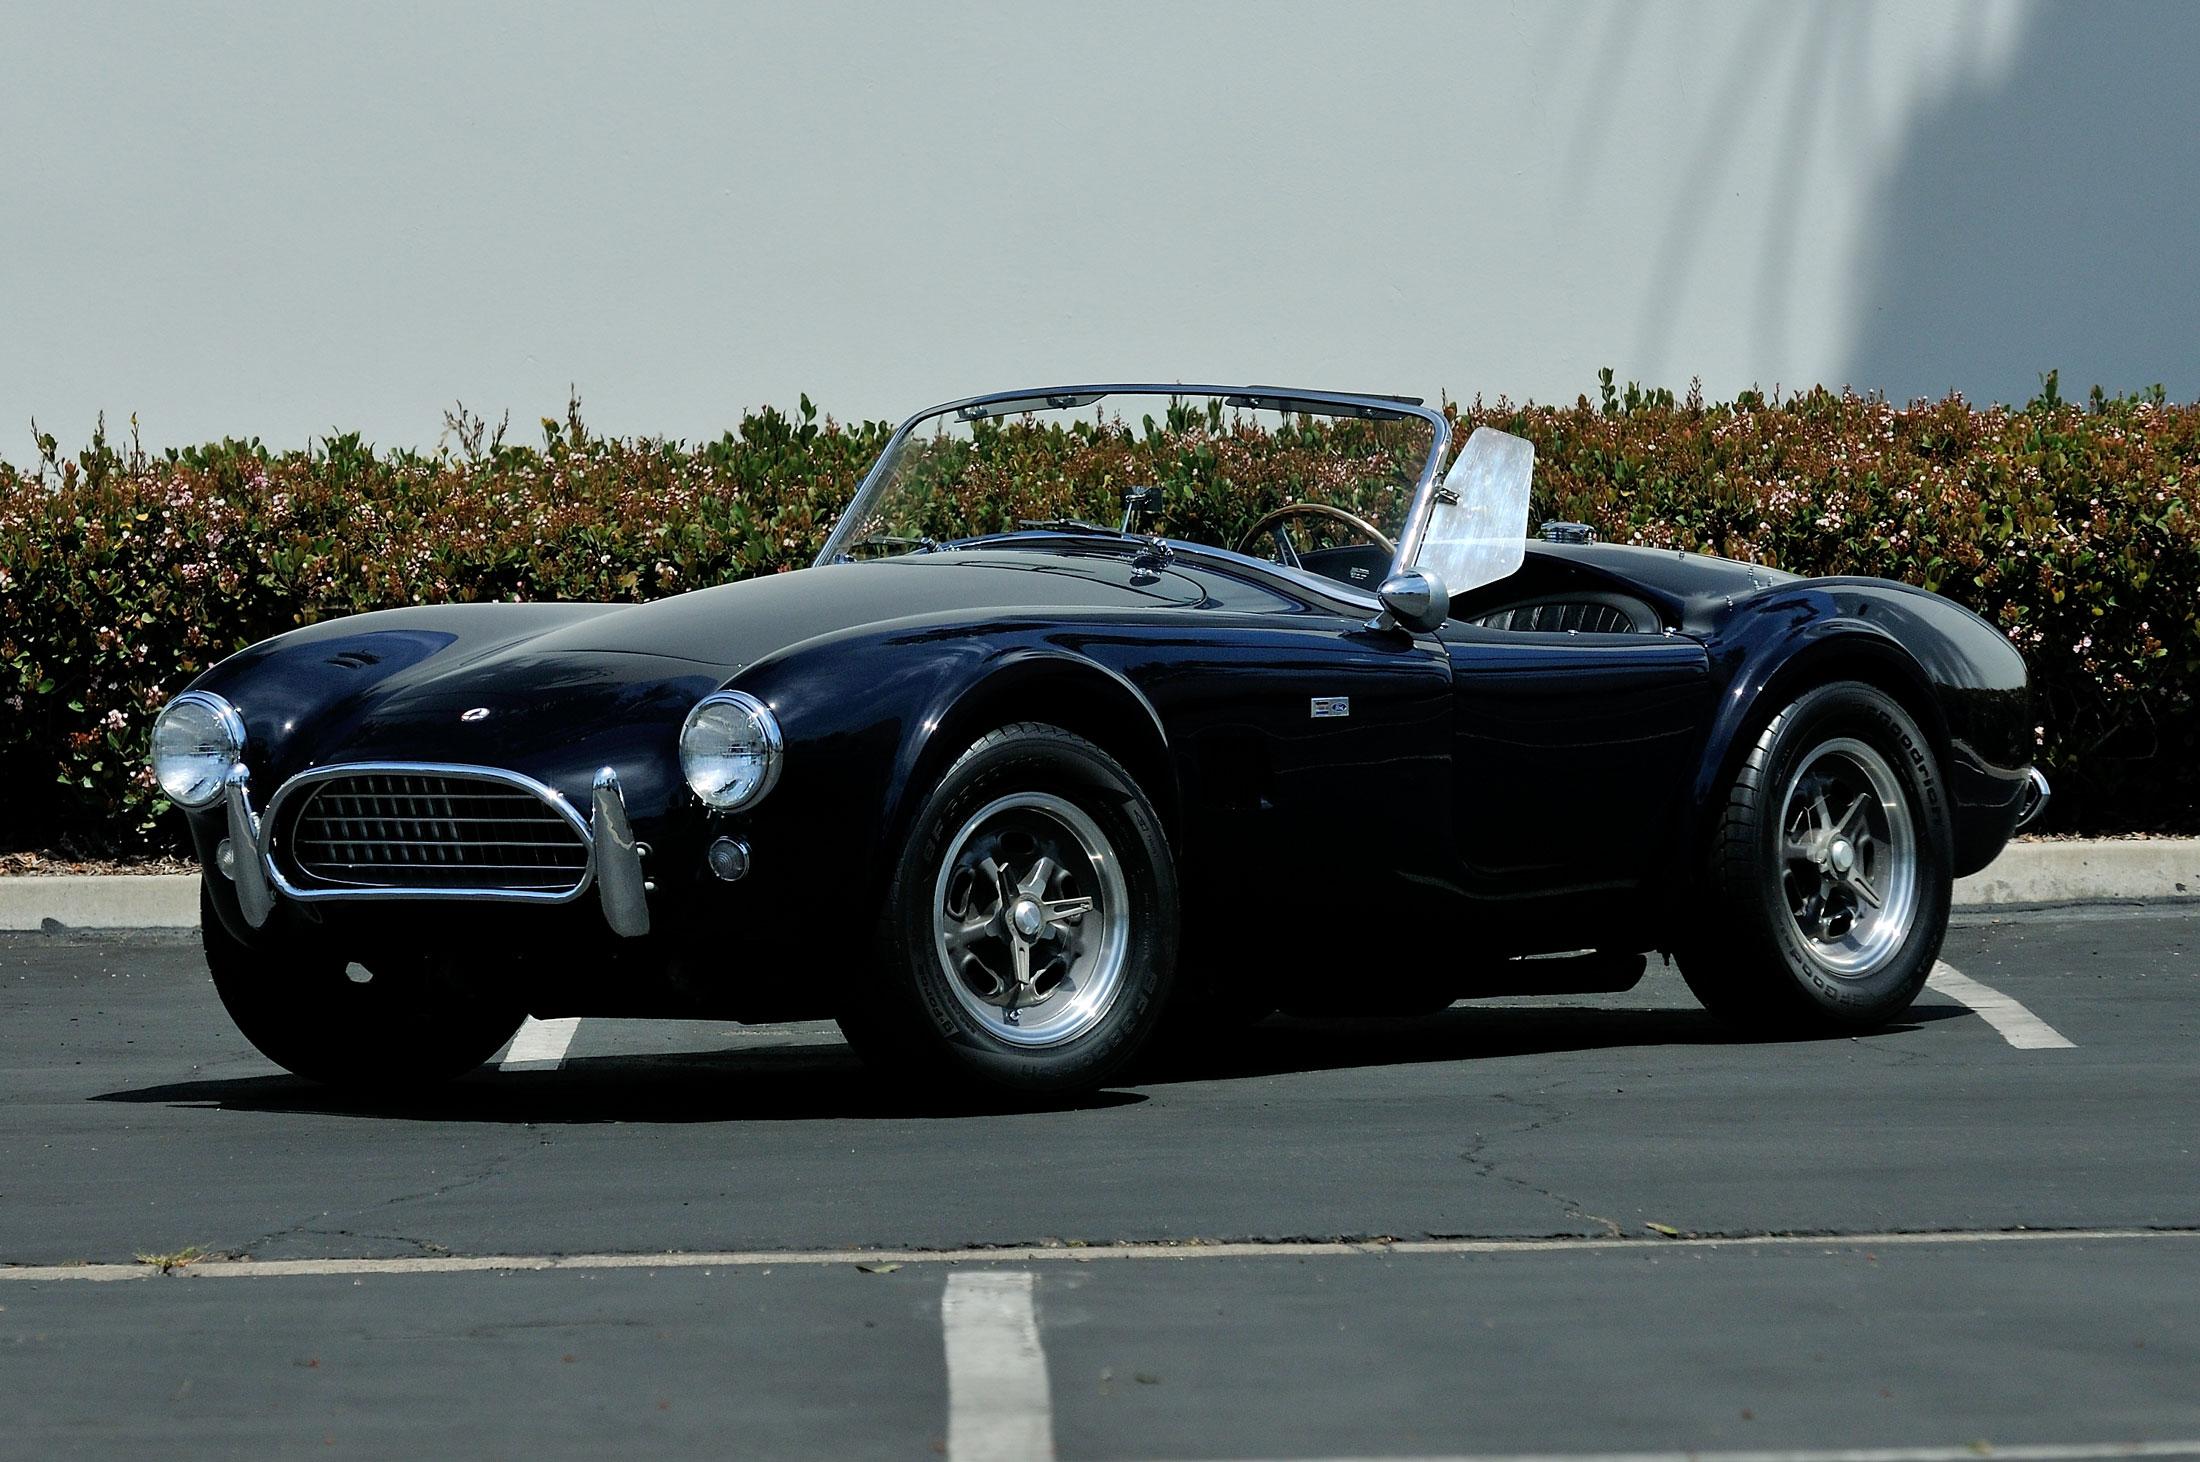 1963 Shelby 289 Cobra Roadster | Mecum Auctions | Estimate: $1,250,000